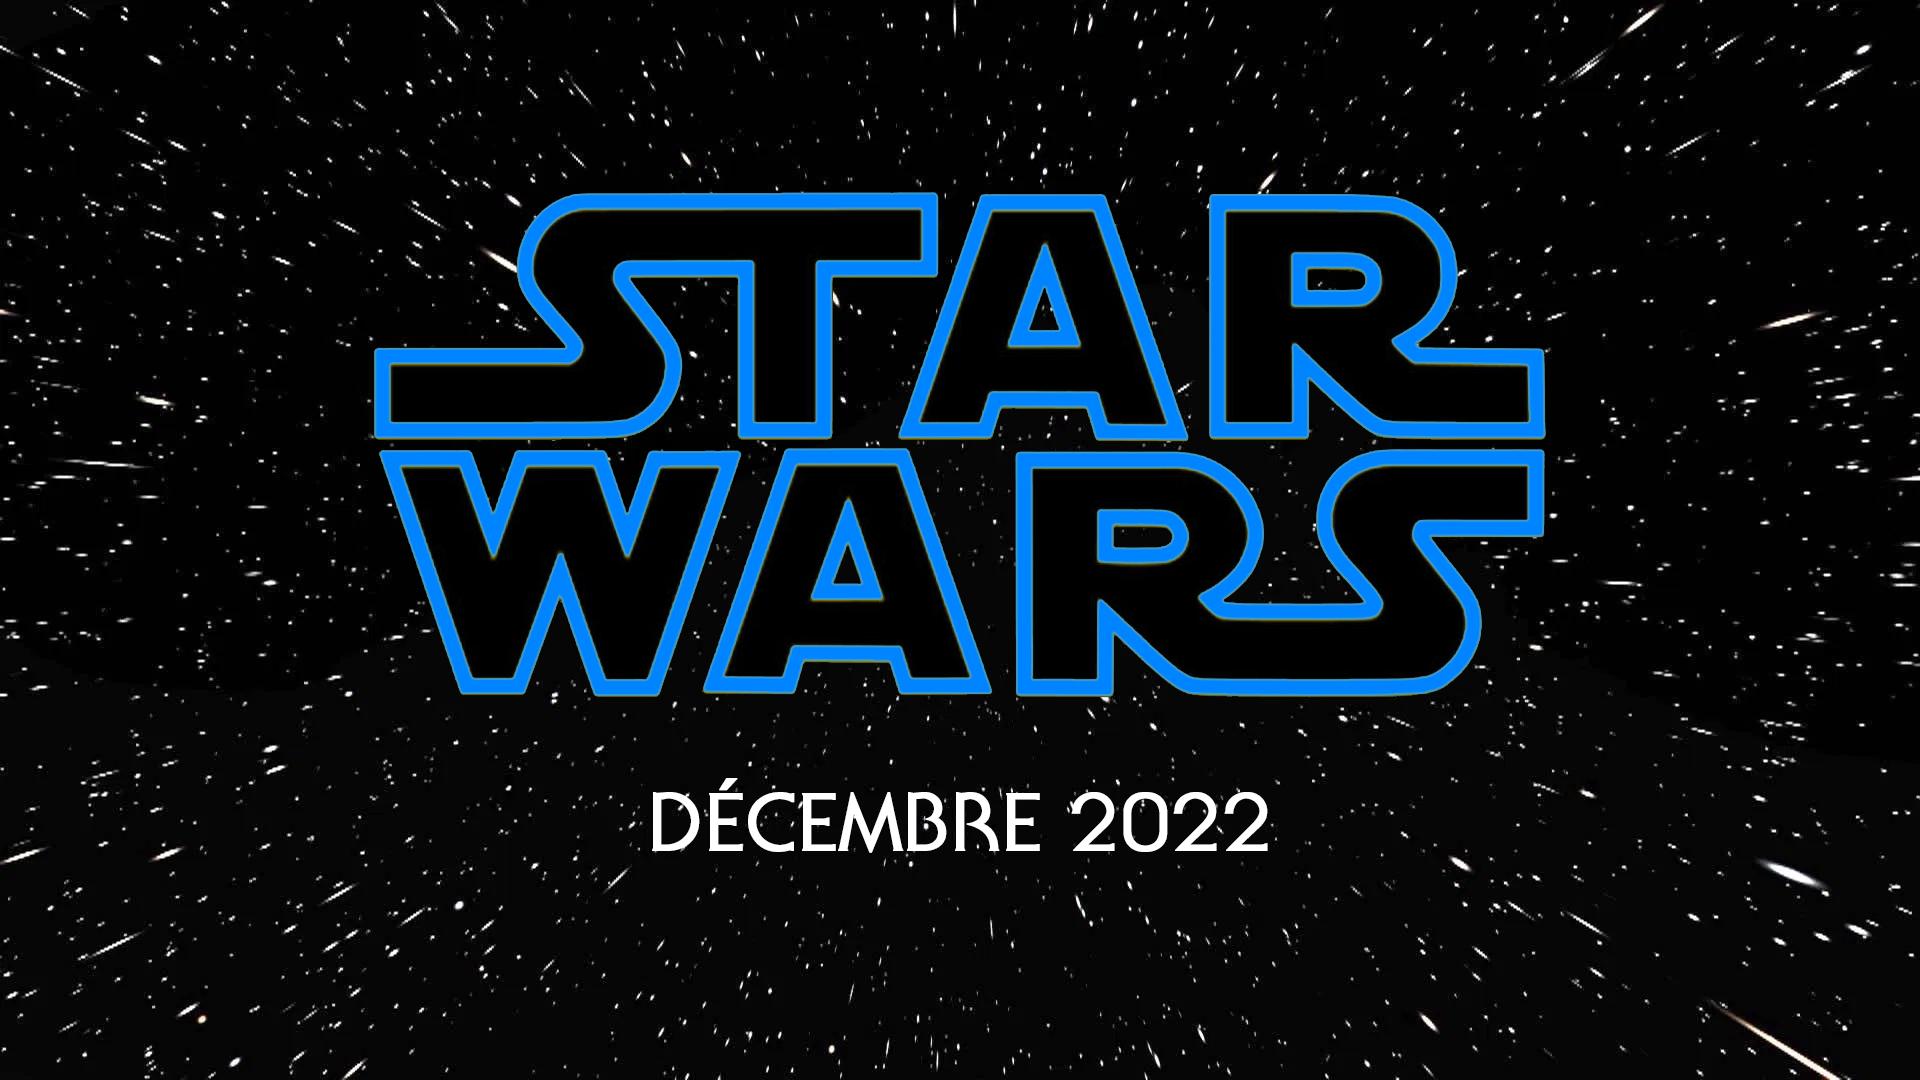 Star Wars 2022